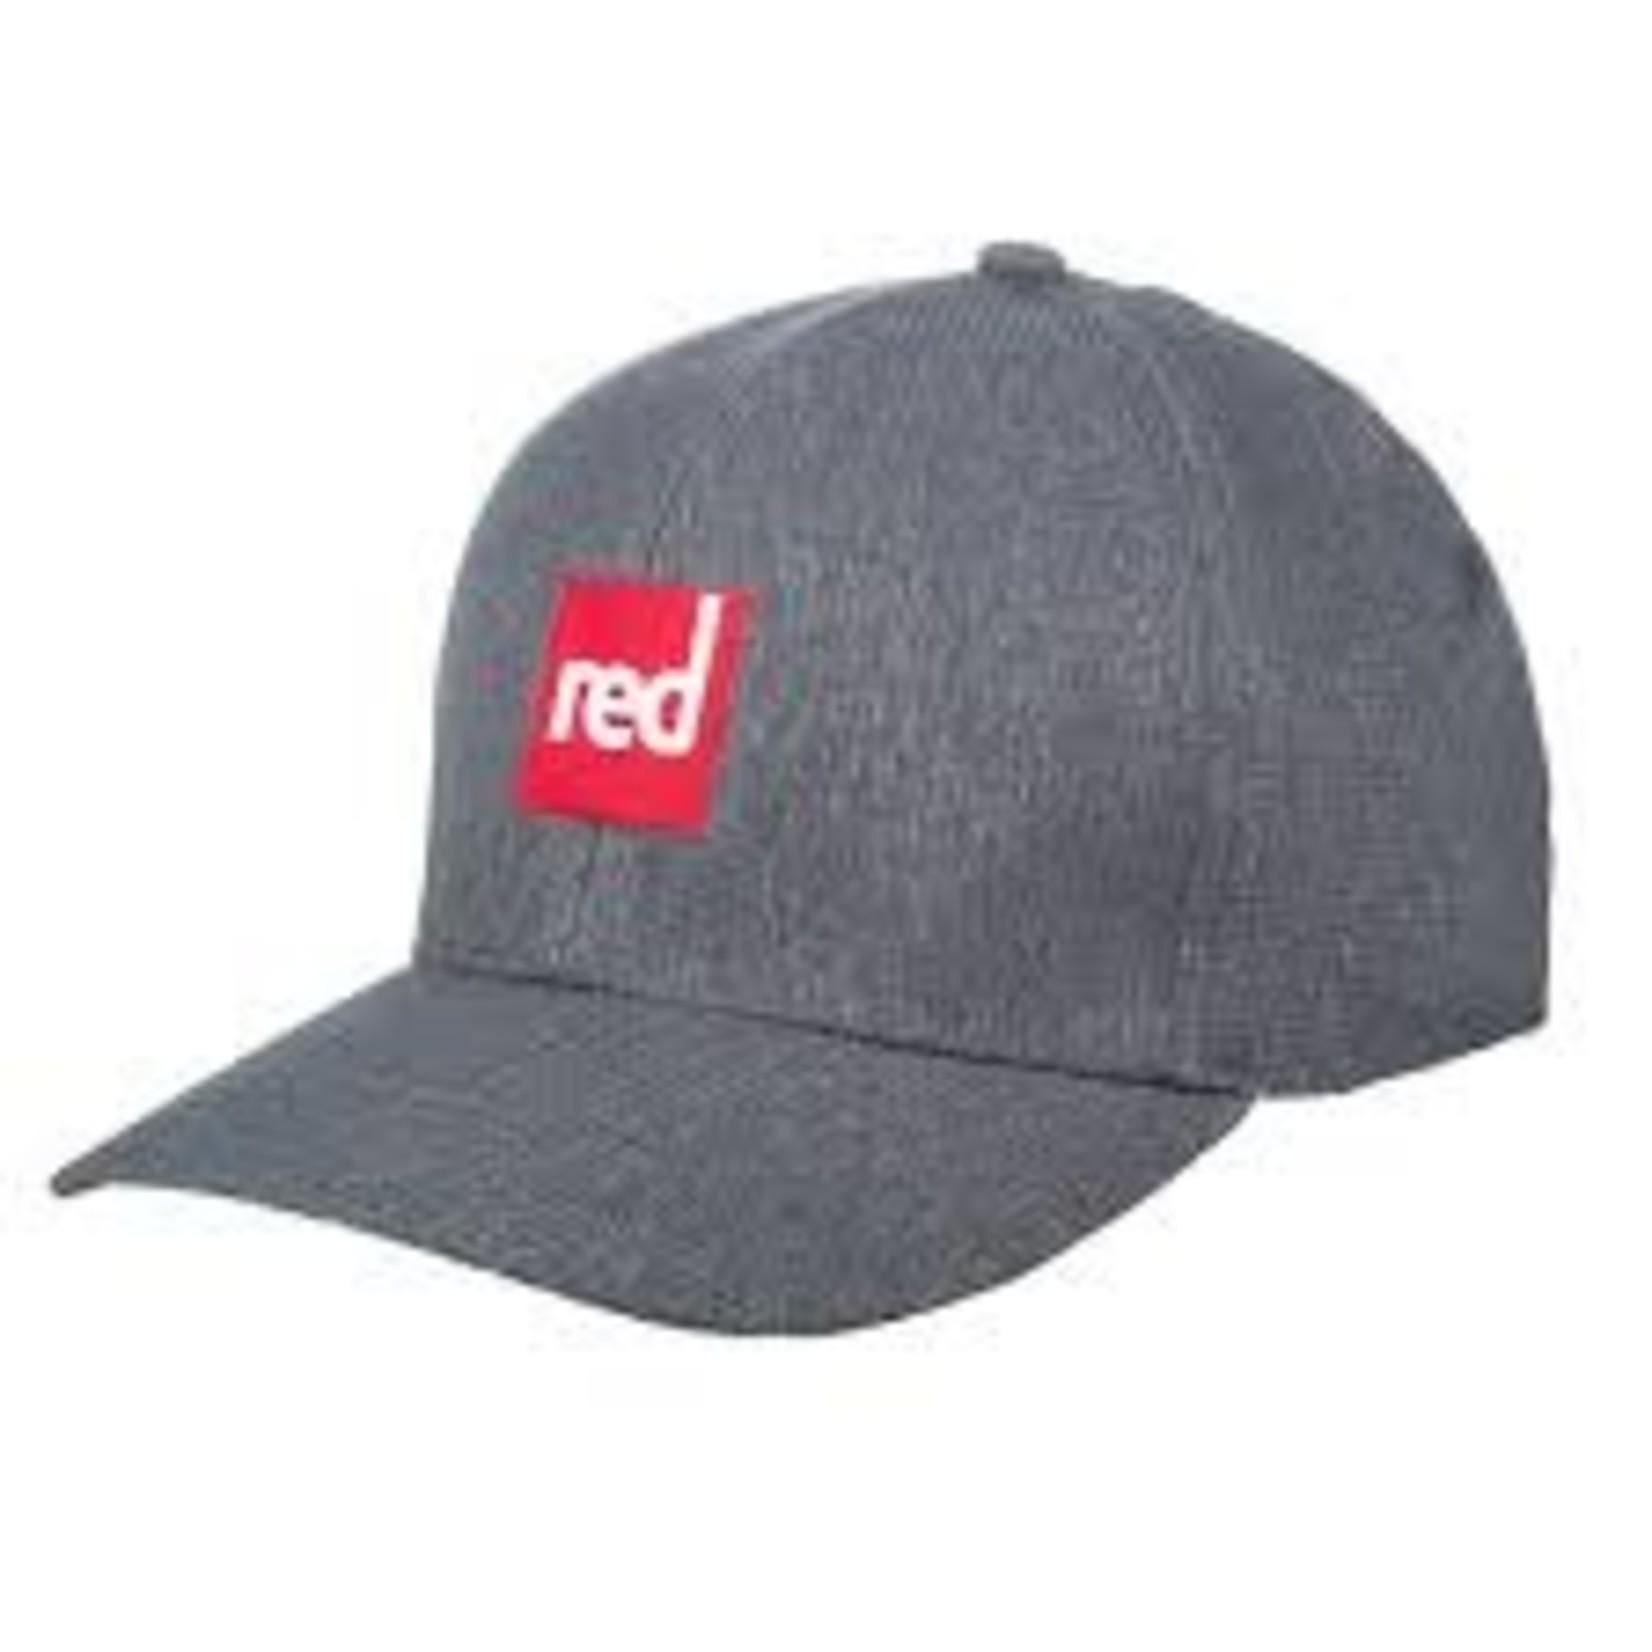 REDPaddle Co. Paddle Hat-Grey